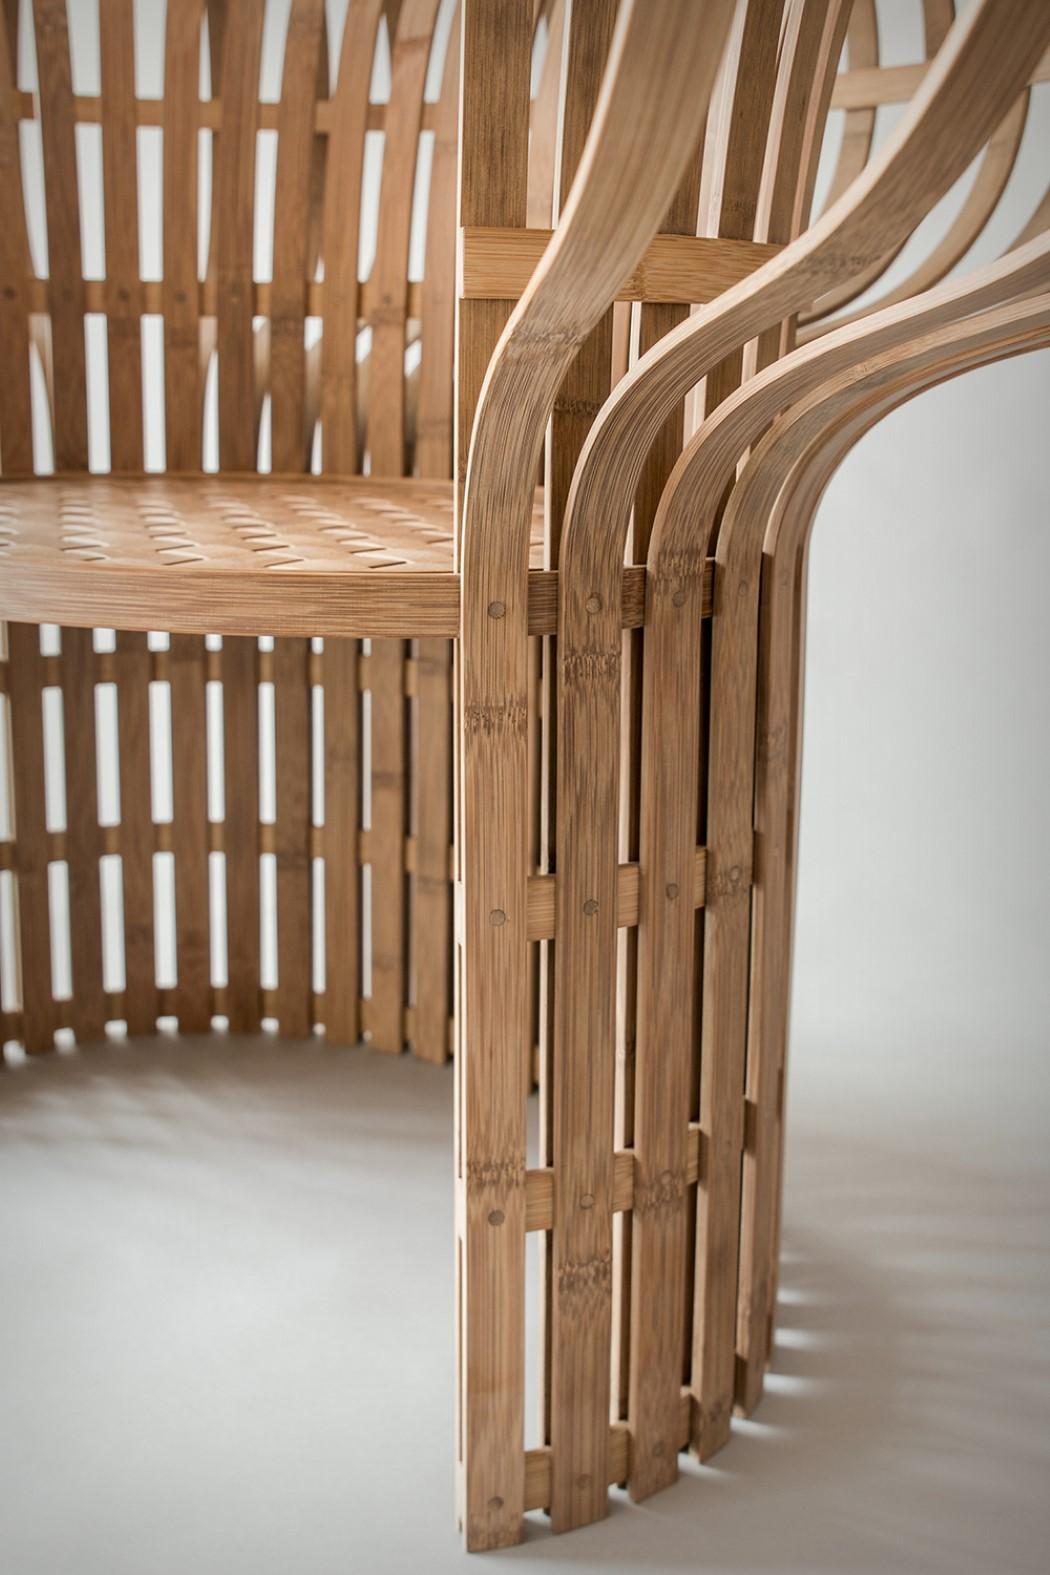 indigo_dyed_bamboo_chair_4